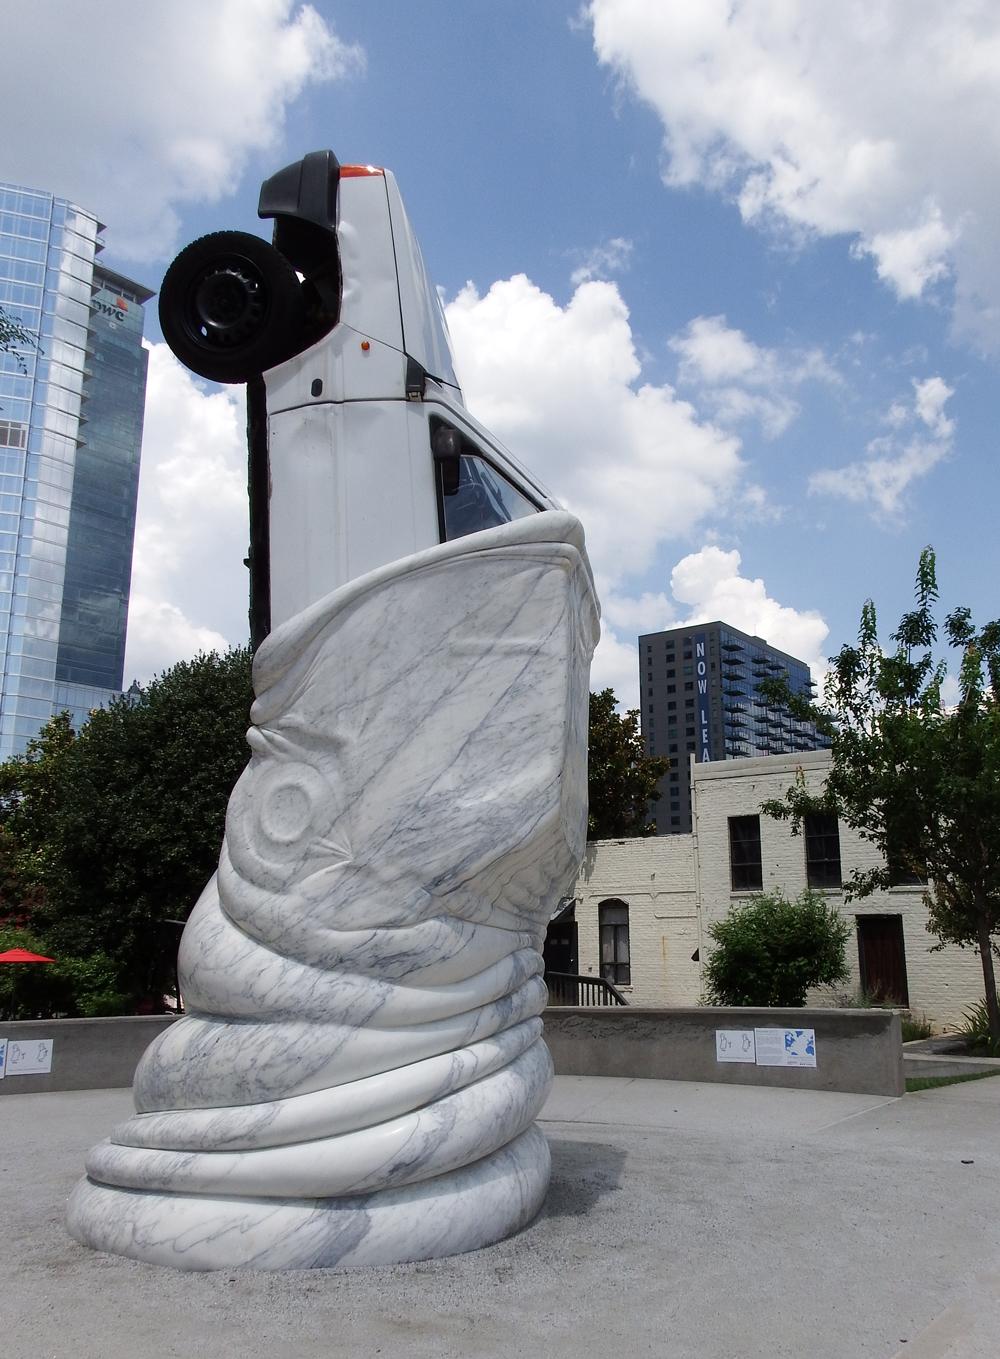 Atlanta Magazine: Midtown's Rockspinner has been replaced. Meet Autoeater.